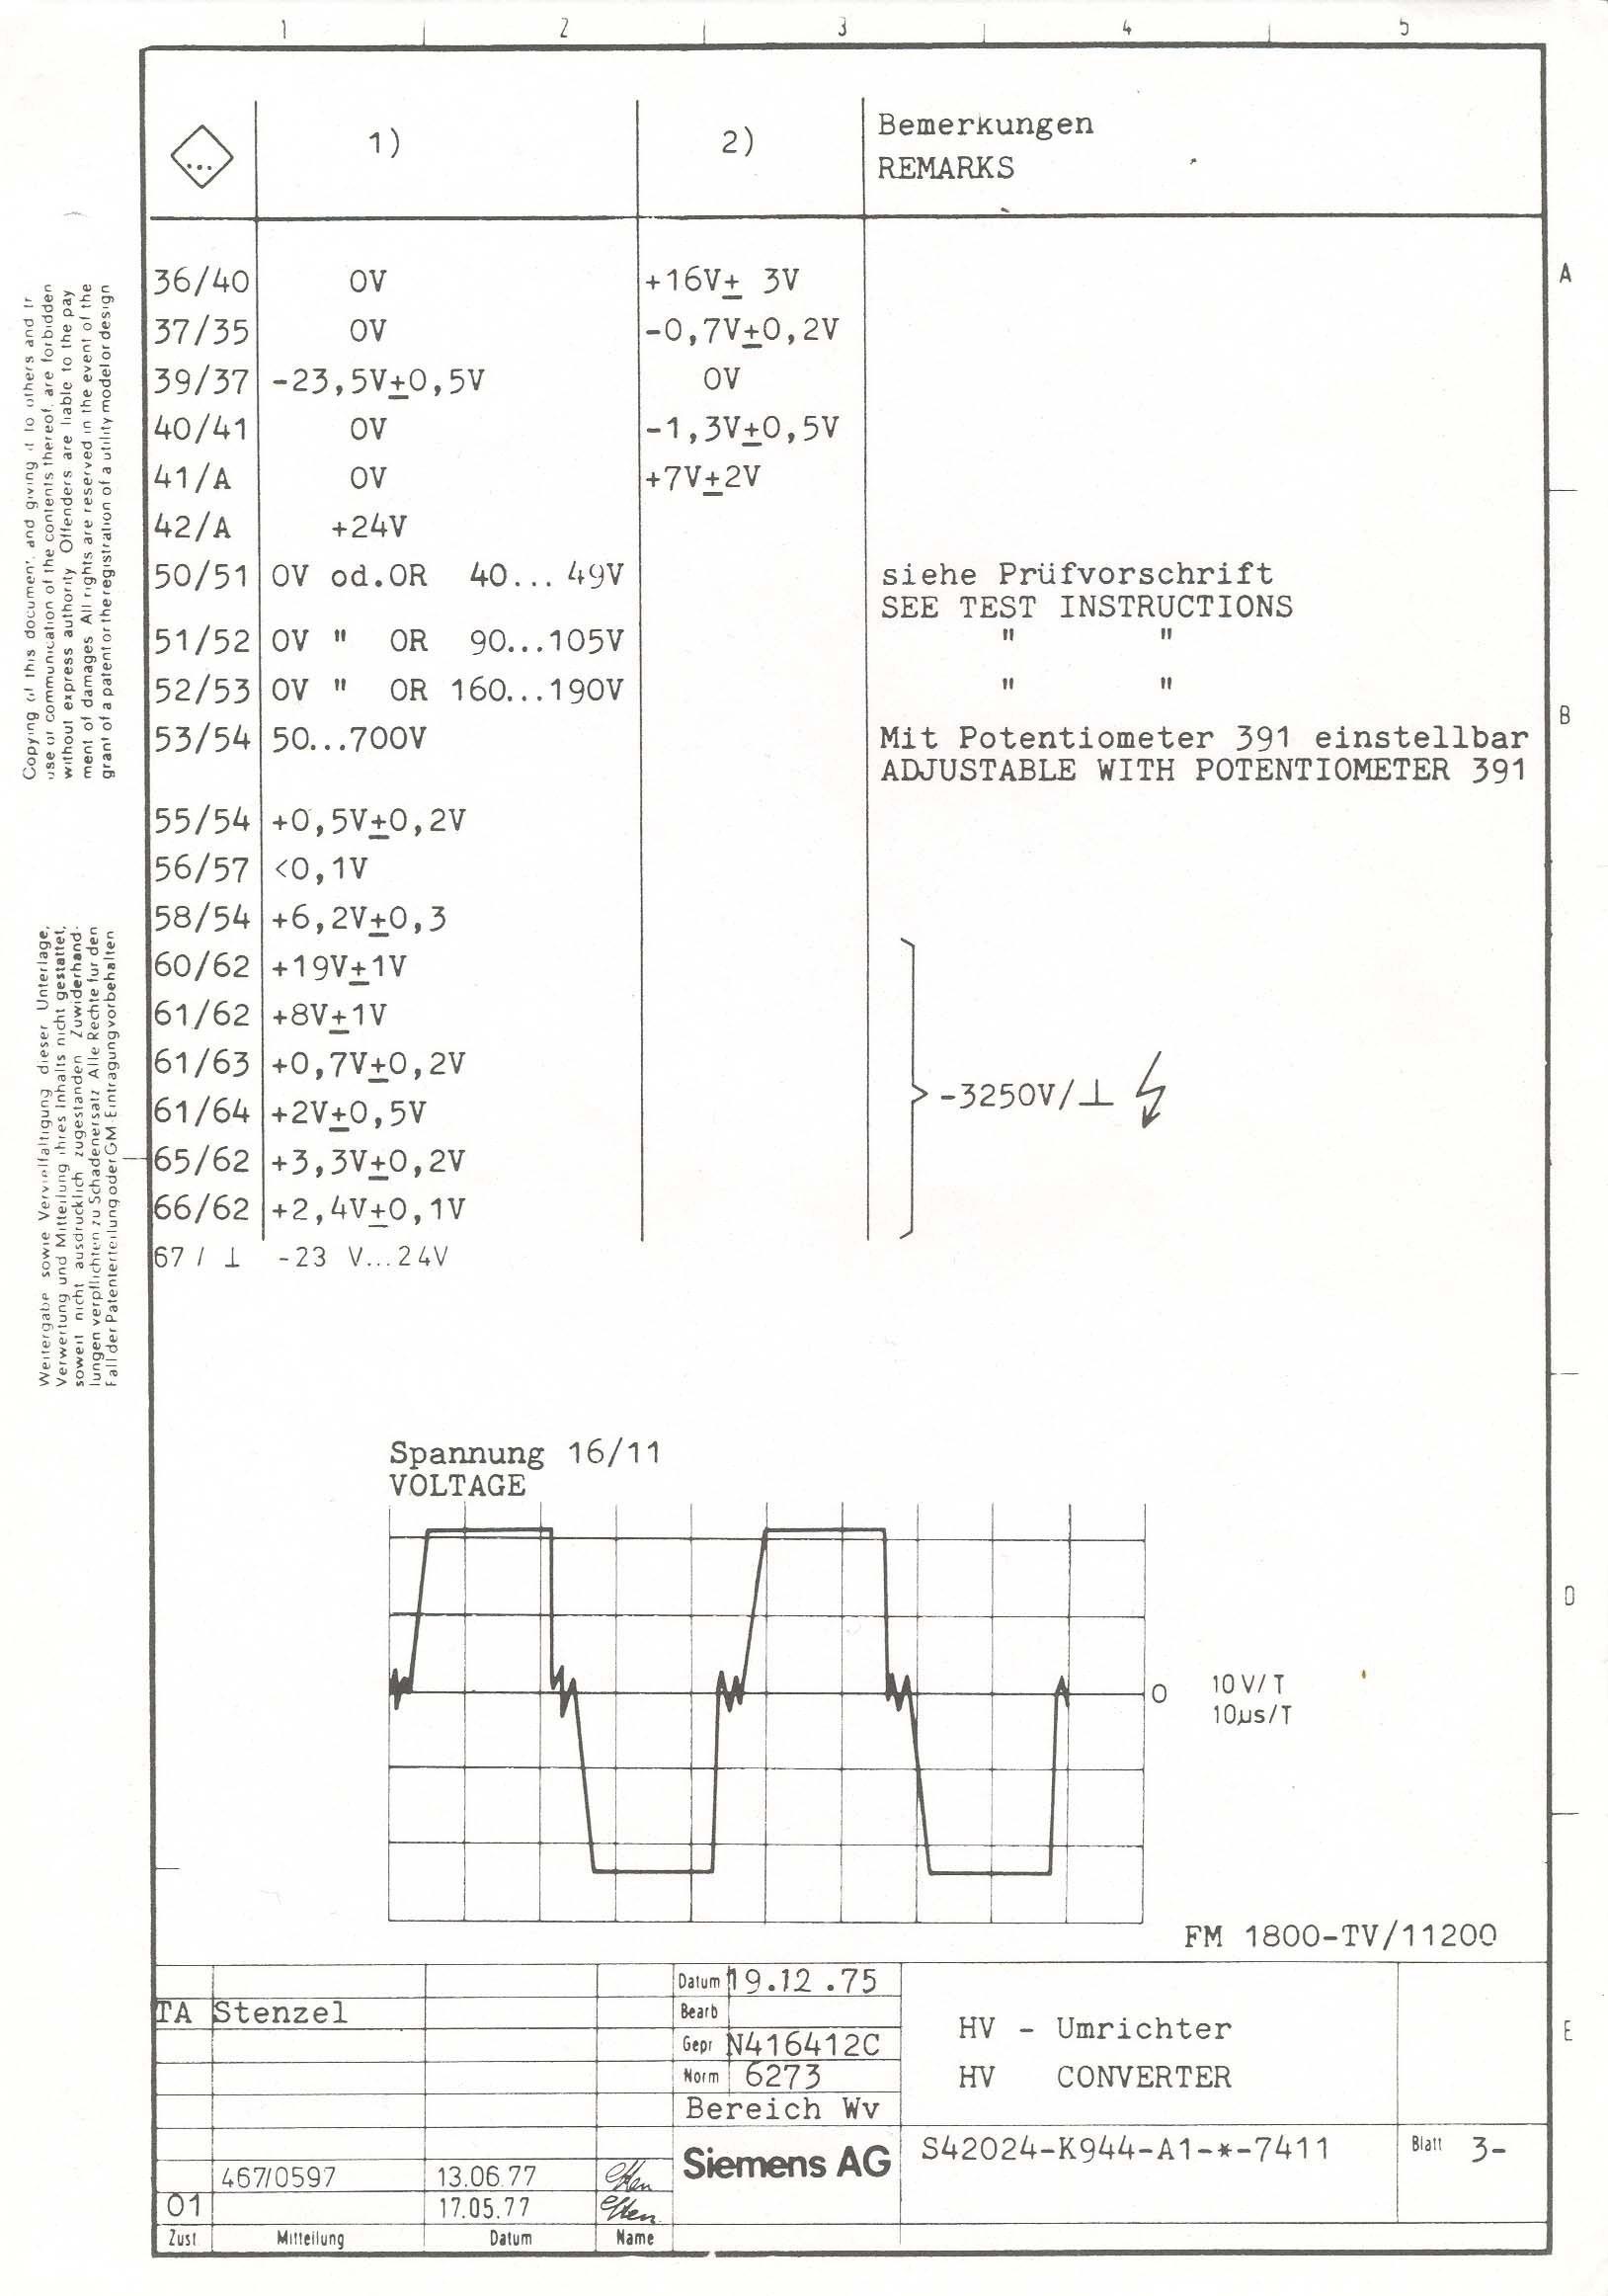 Receptacle Wiring Diagram Inspirational Electrical Outlet Diagram New Electrical Outlet Wiring Diagram